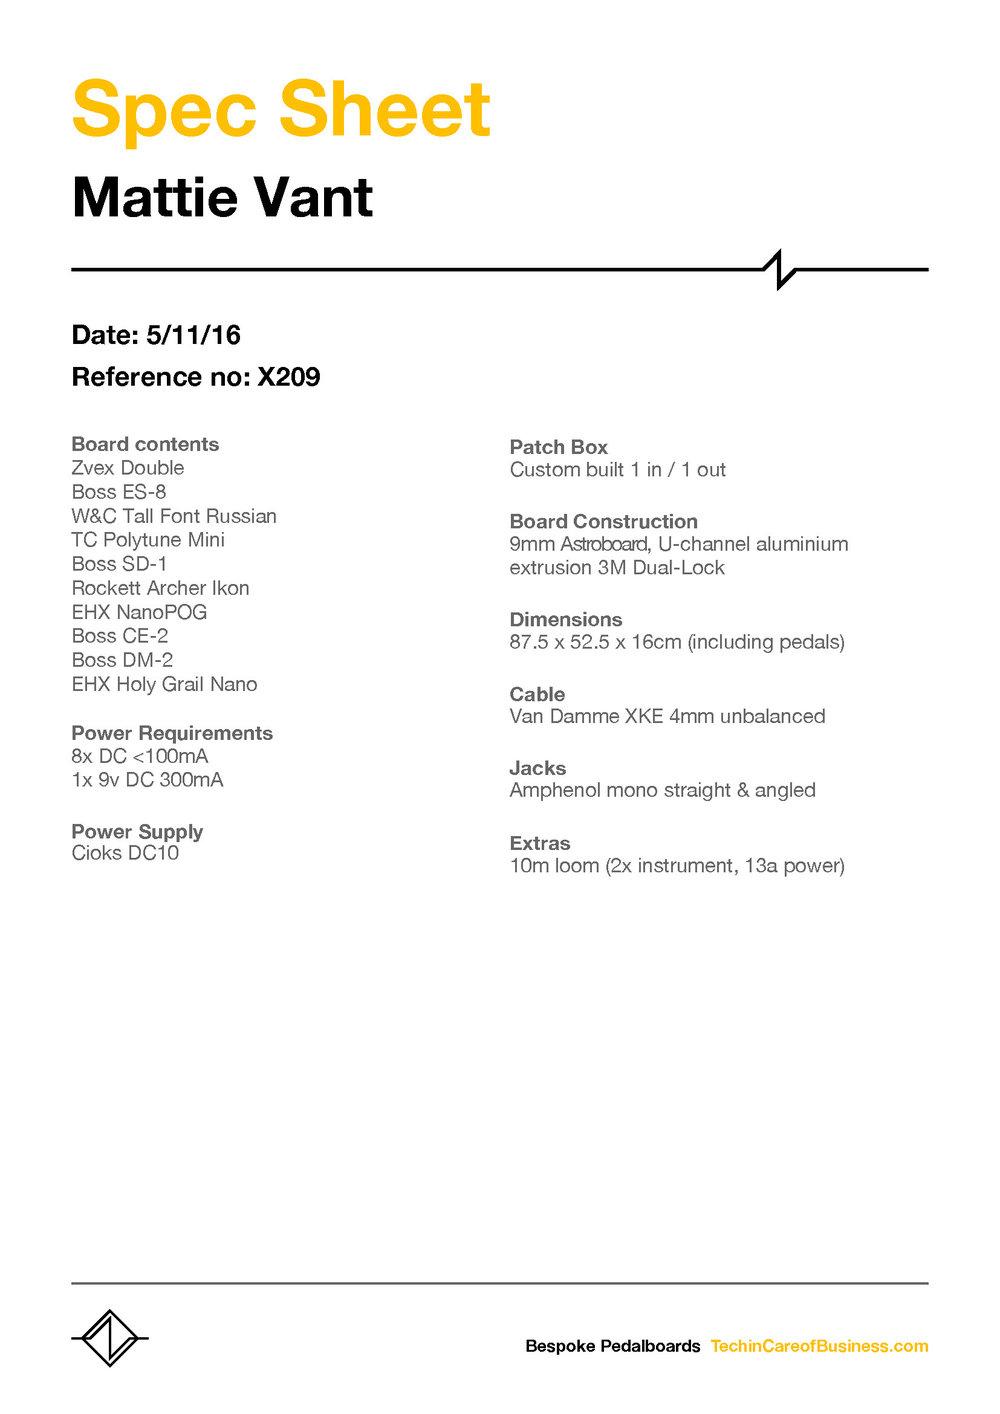 MV Spec sheet.jpg